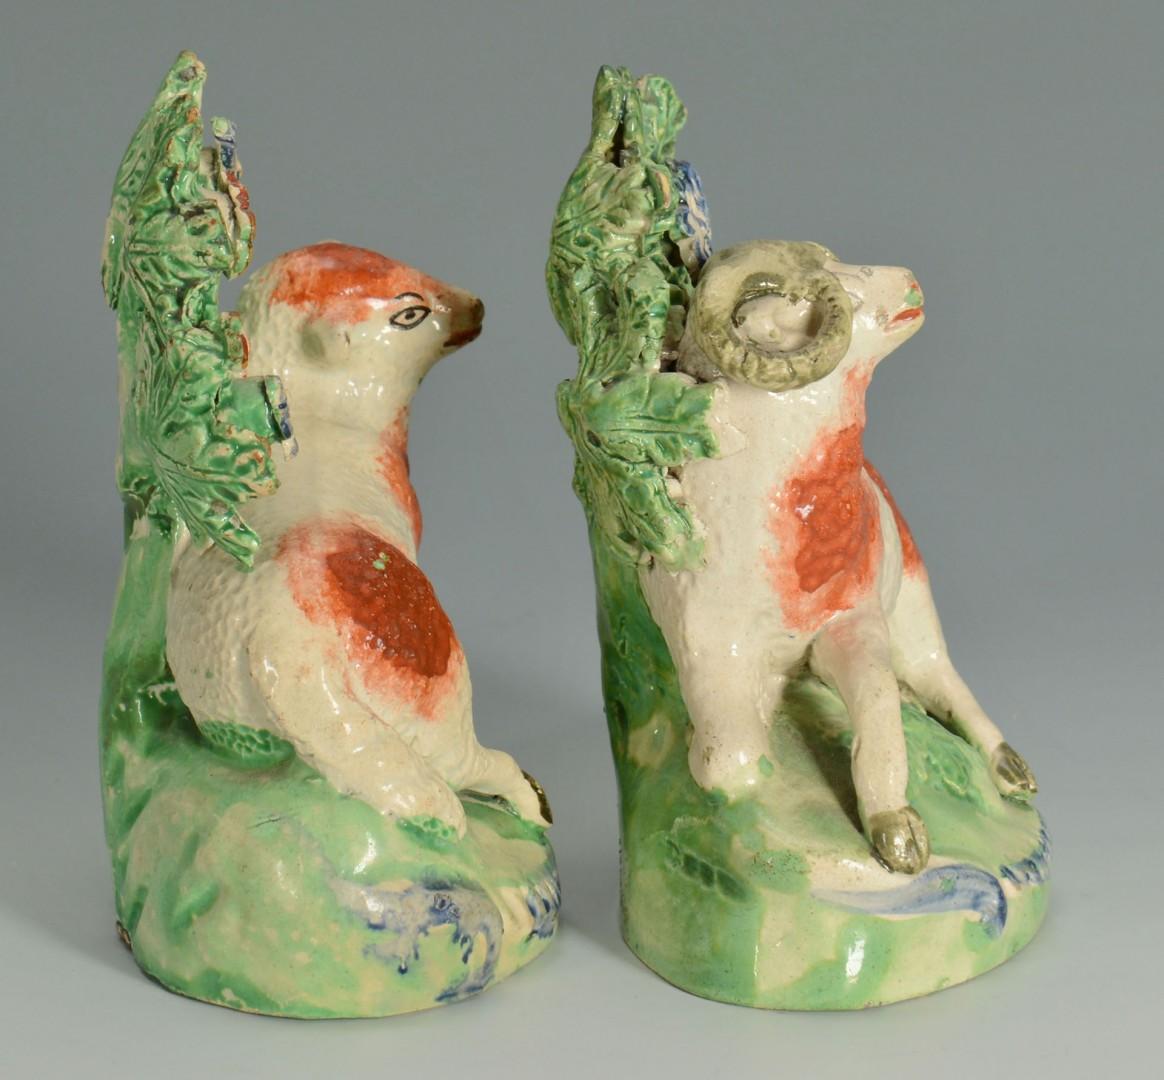 Lot 269: Staffordshire Ewe and Ram